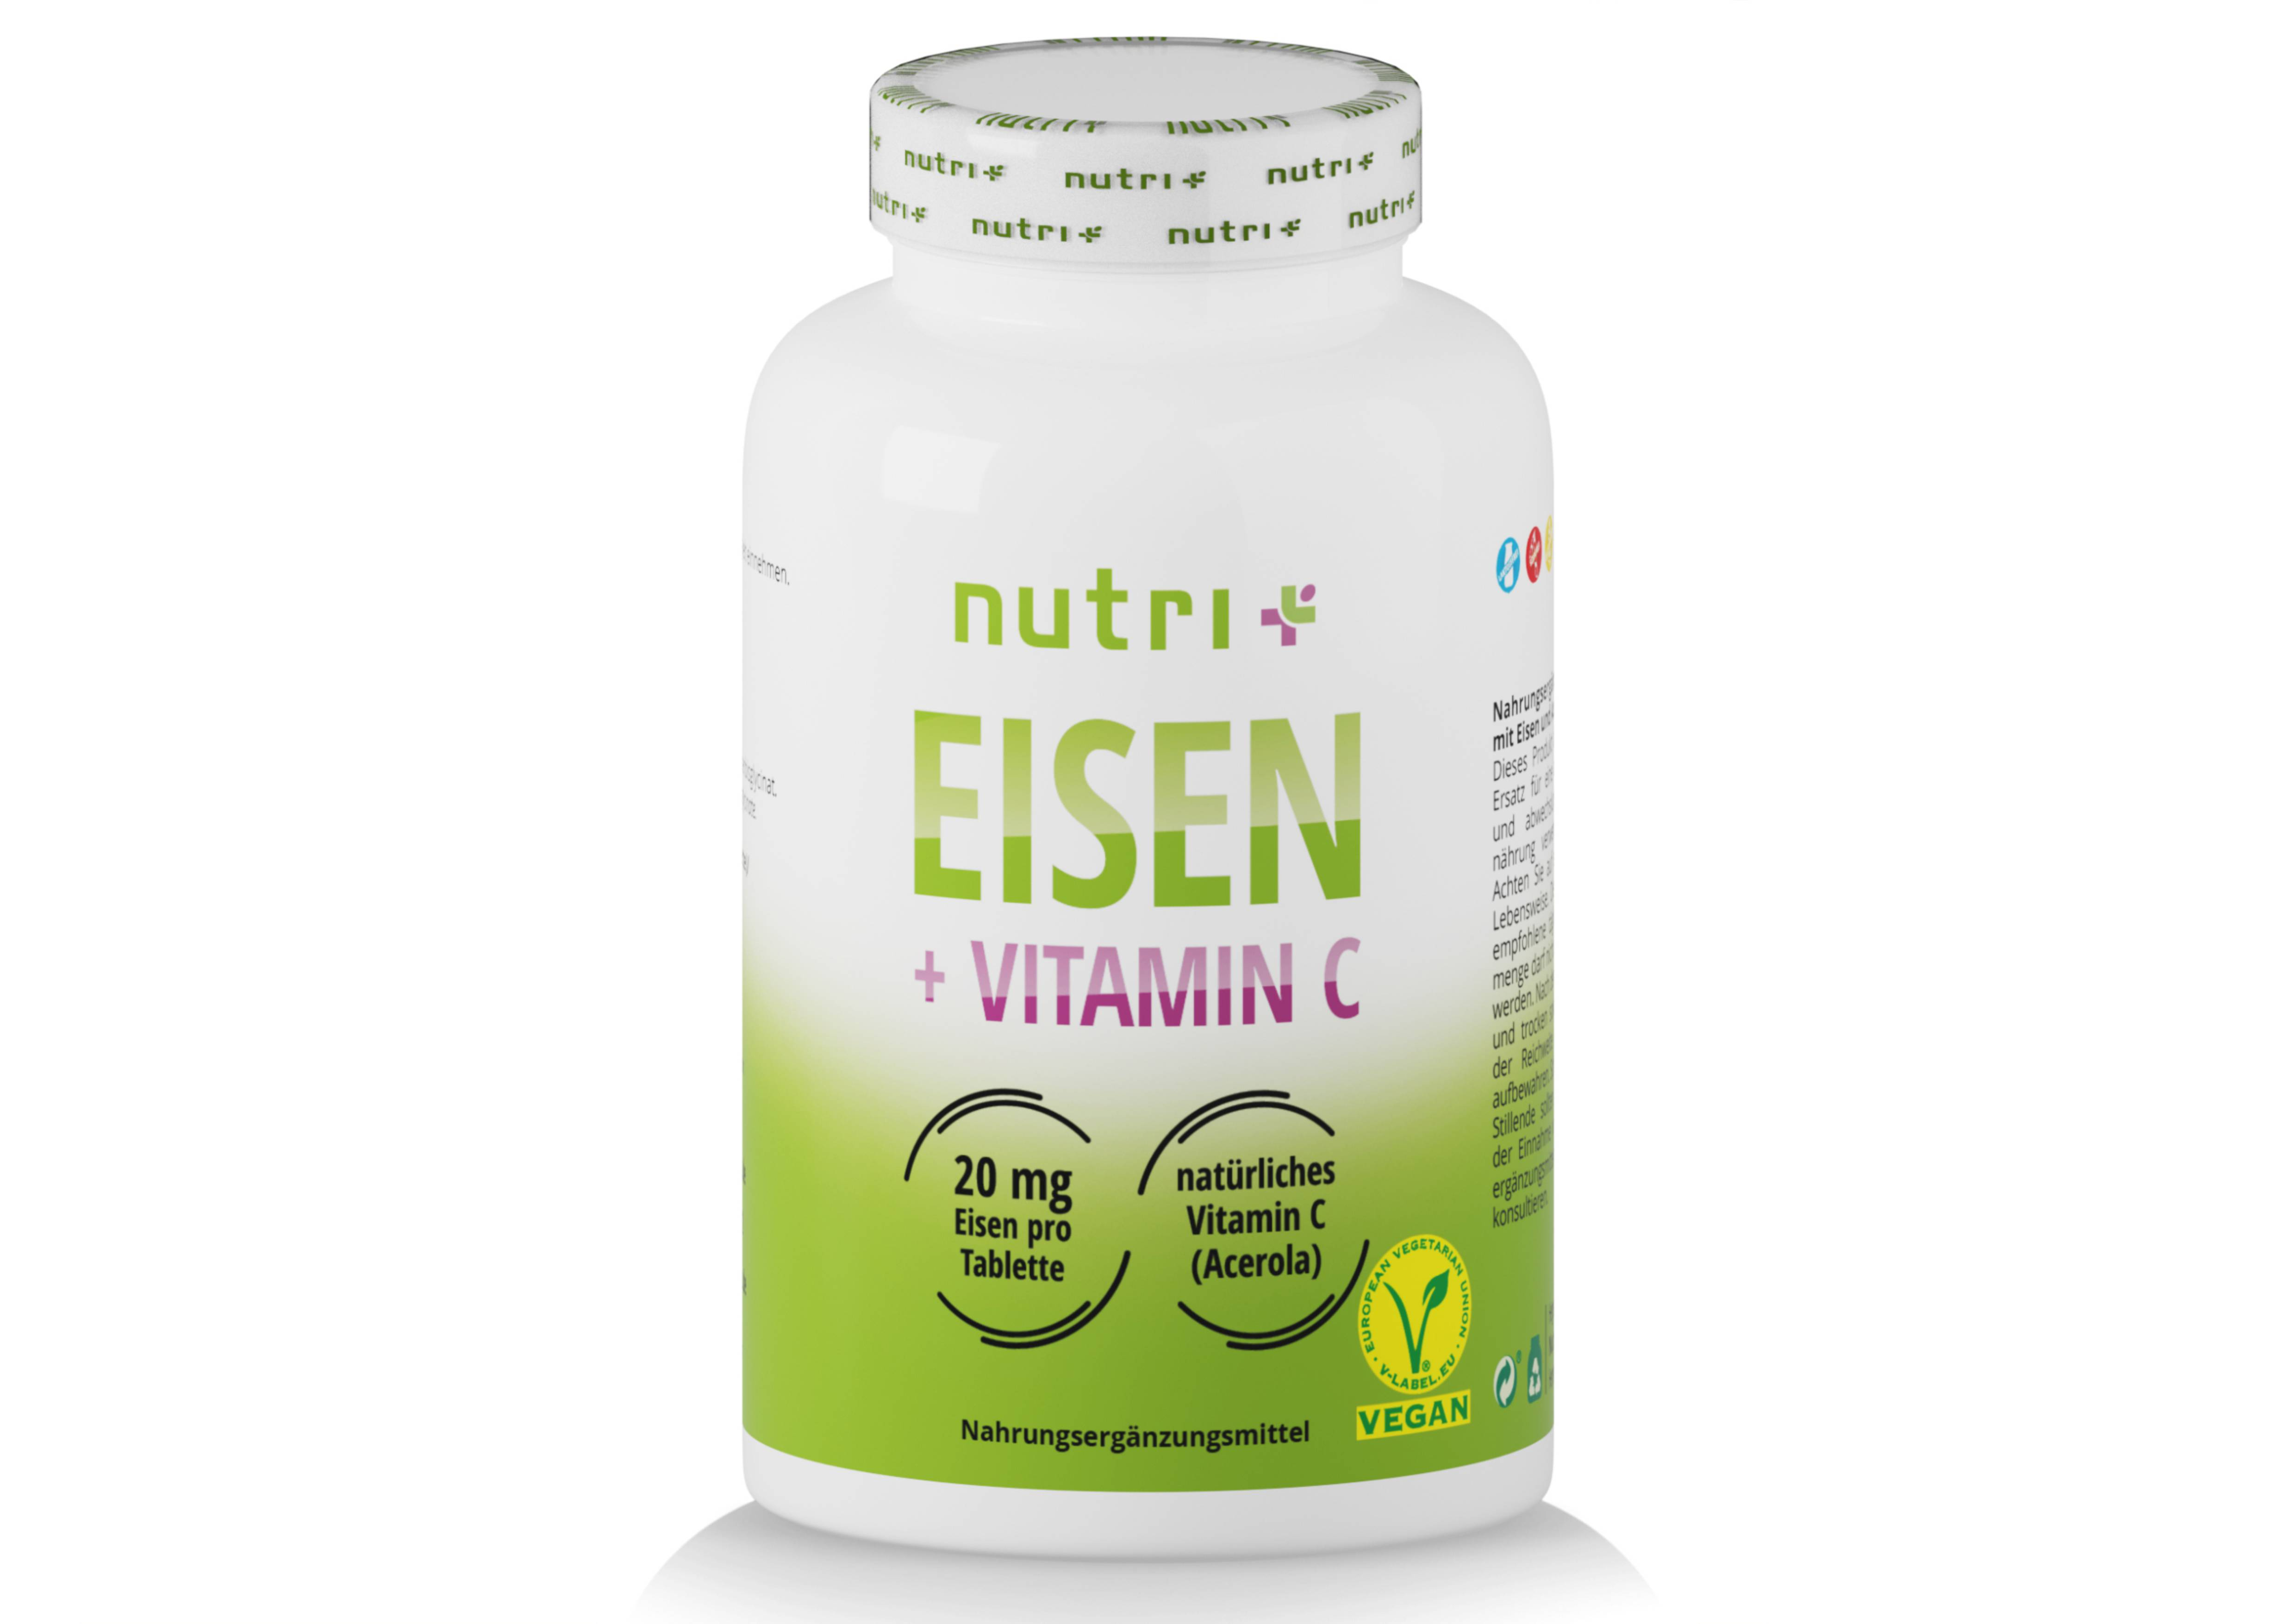 nutri+ Eisen Tabletten + Vitamin C